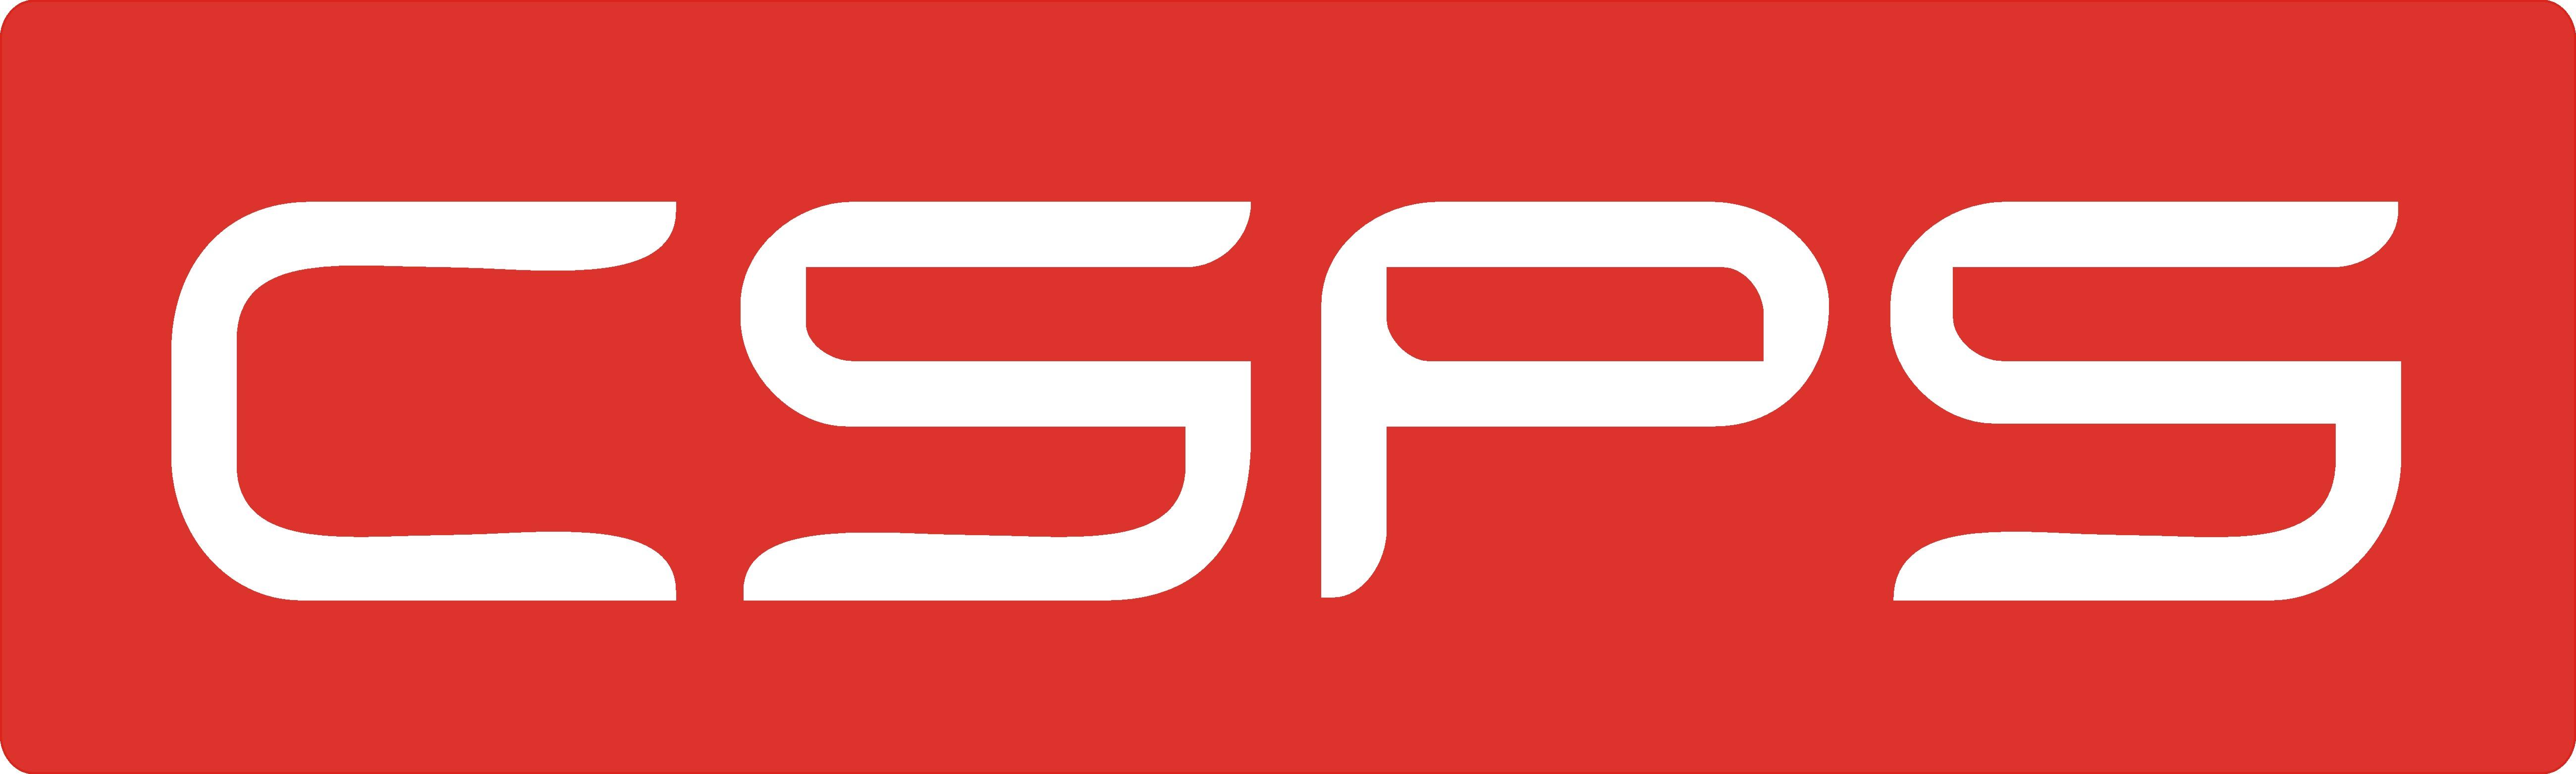 CSPS CO., LTD.-Logo